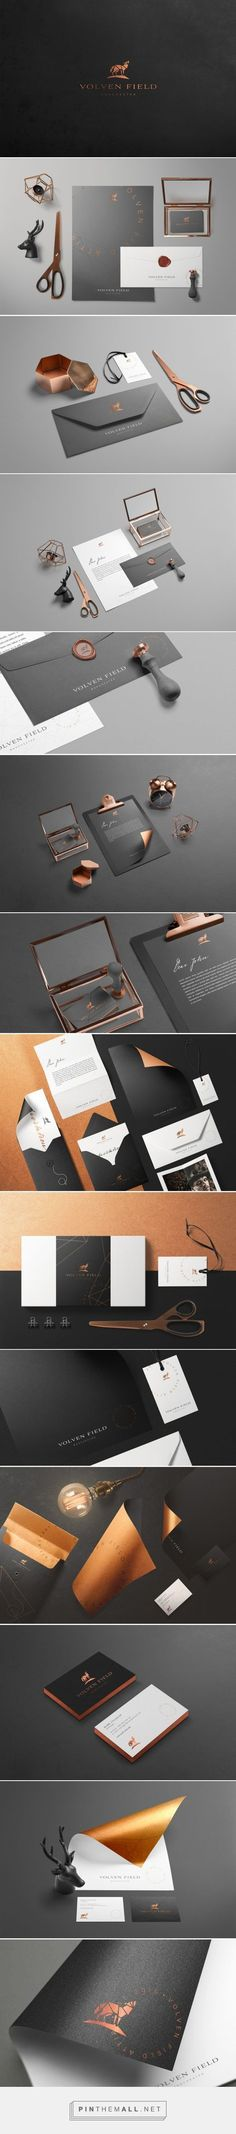 Volven Field Manchester Fashion Designer Branding by Sebastian Bednarek | Fivestar Branding Agency – Design and Branding Agency & Curated Inspiration Gallery